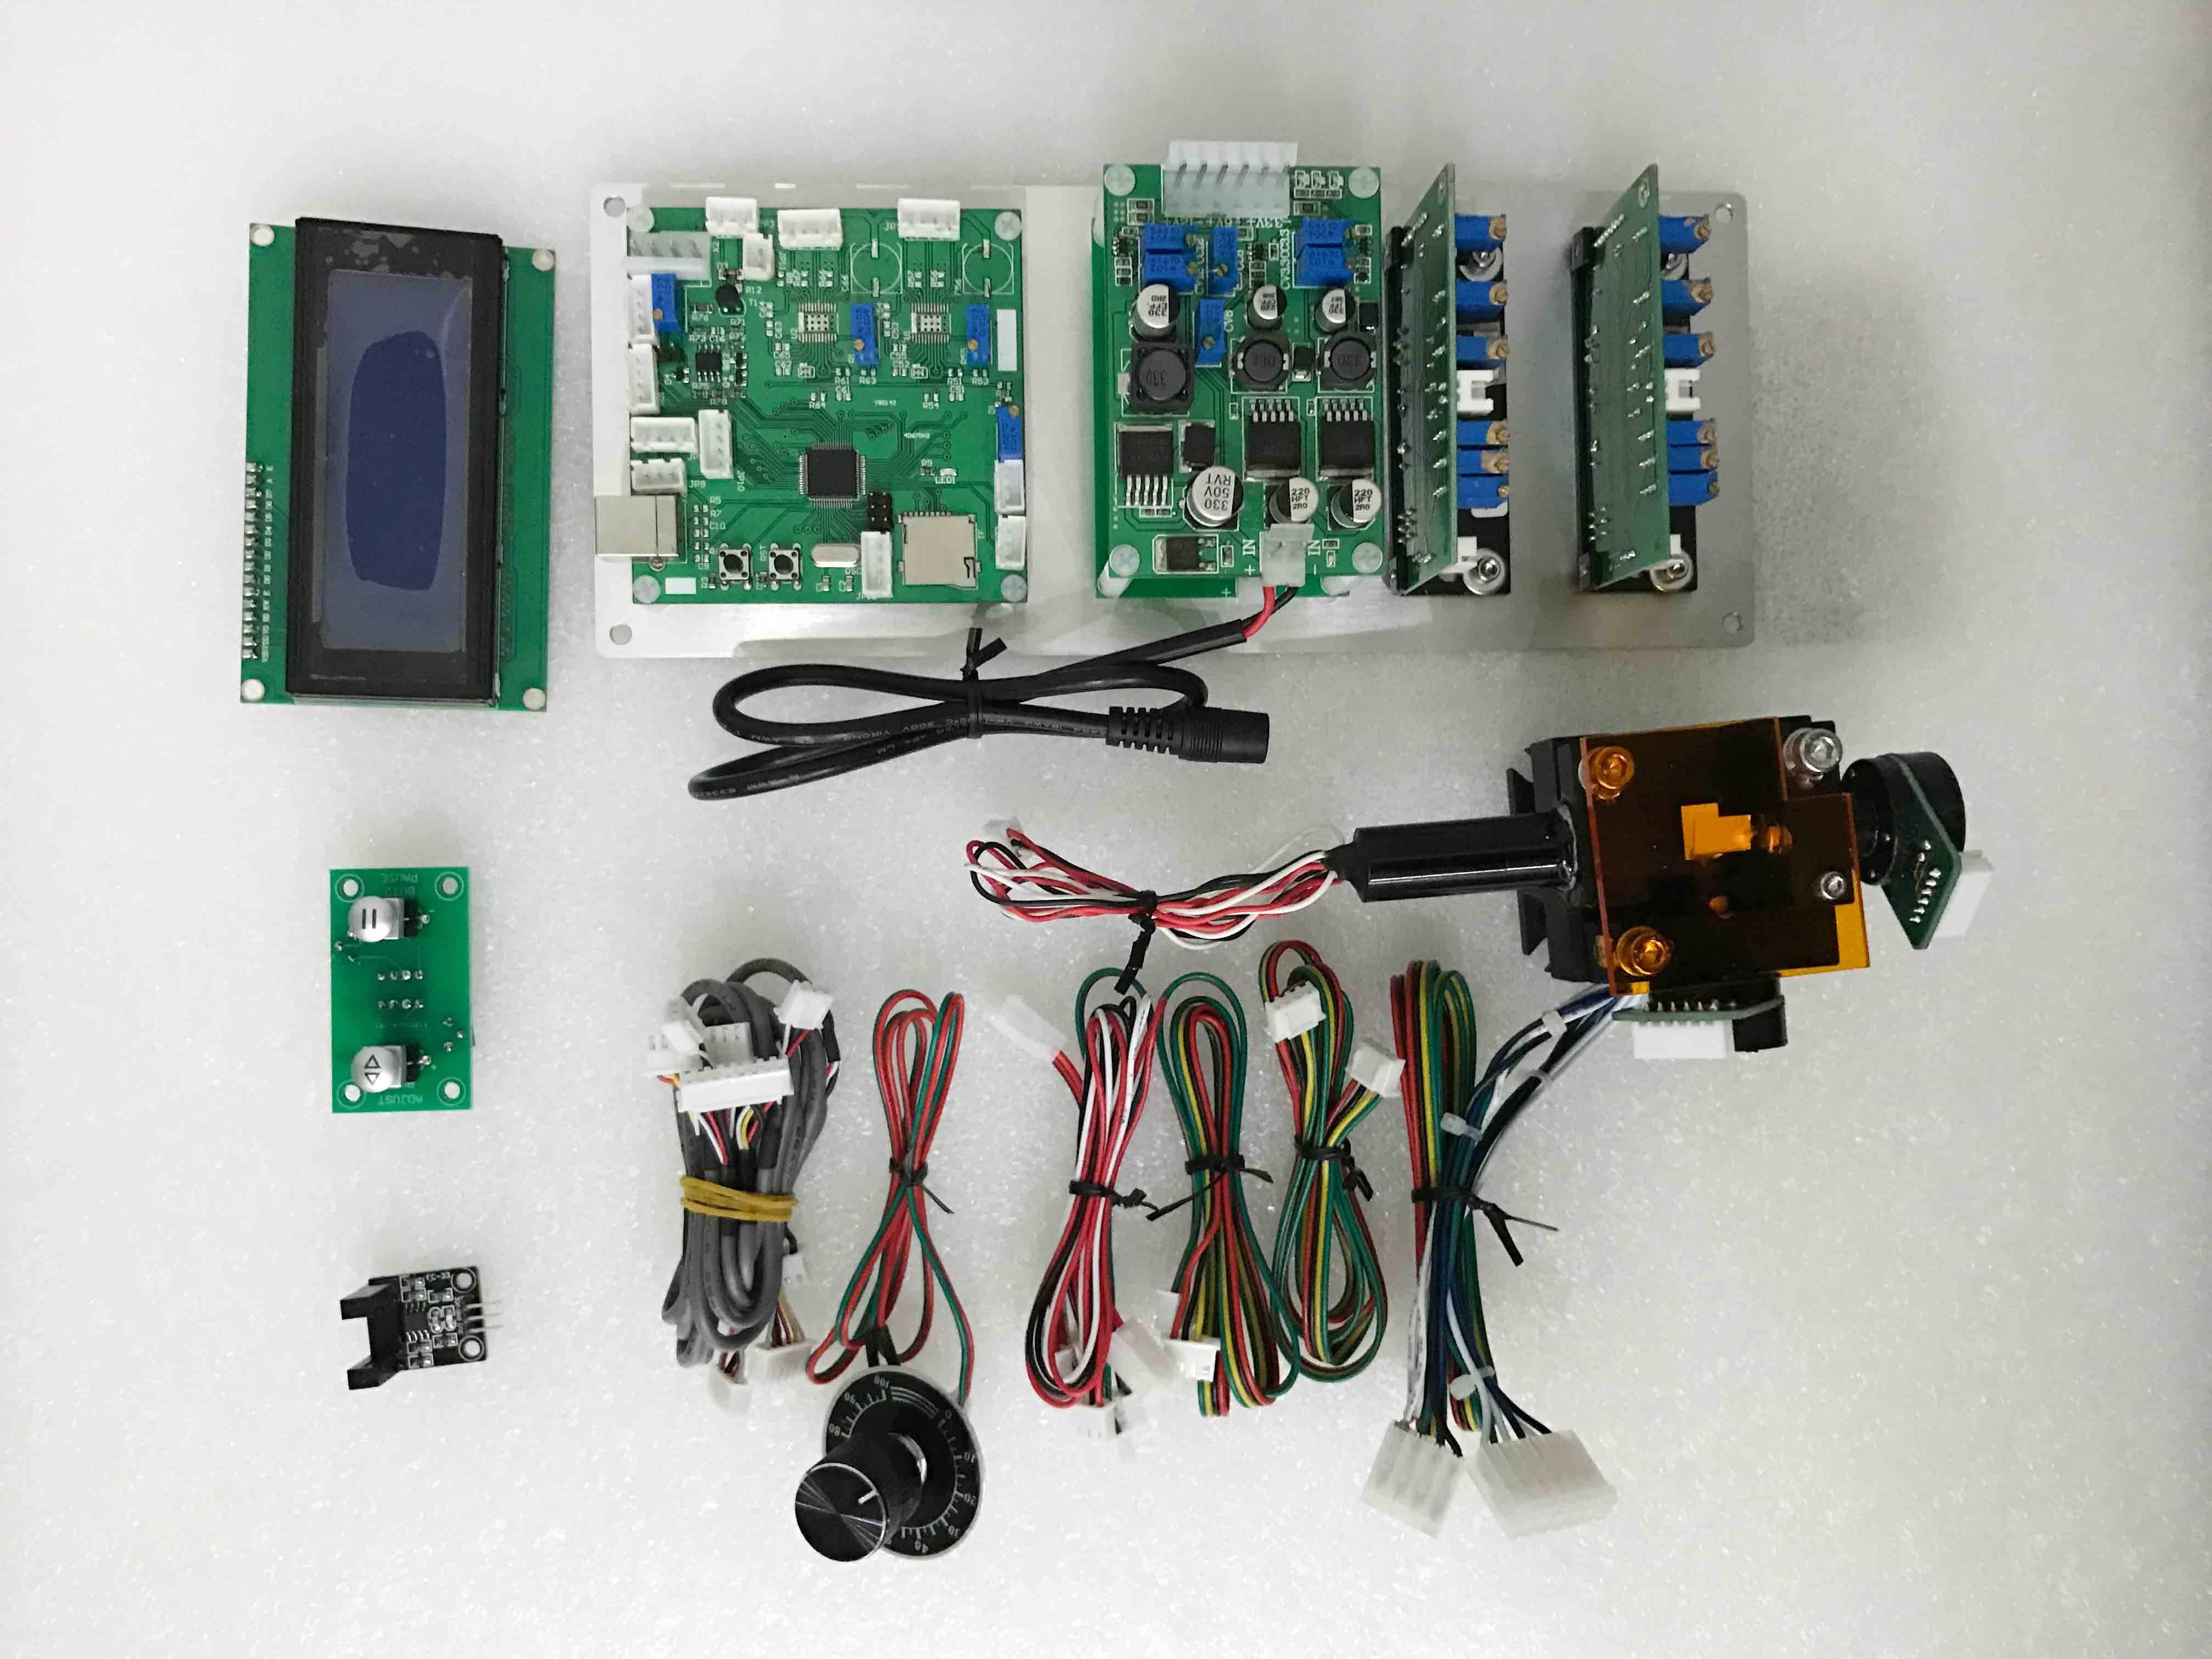 Core Components for SLA 3D Printer